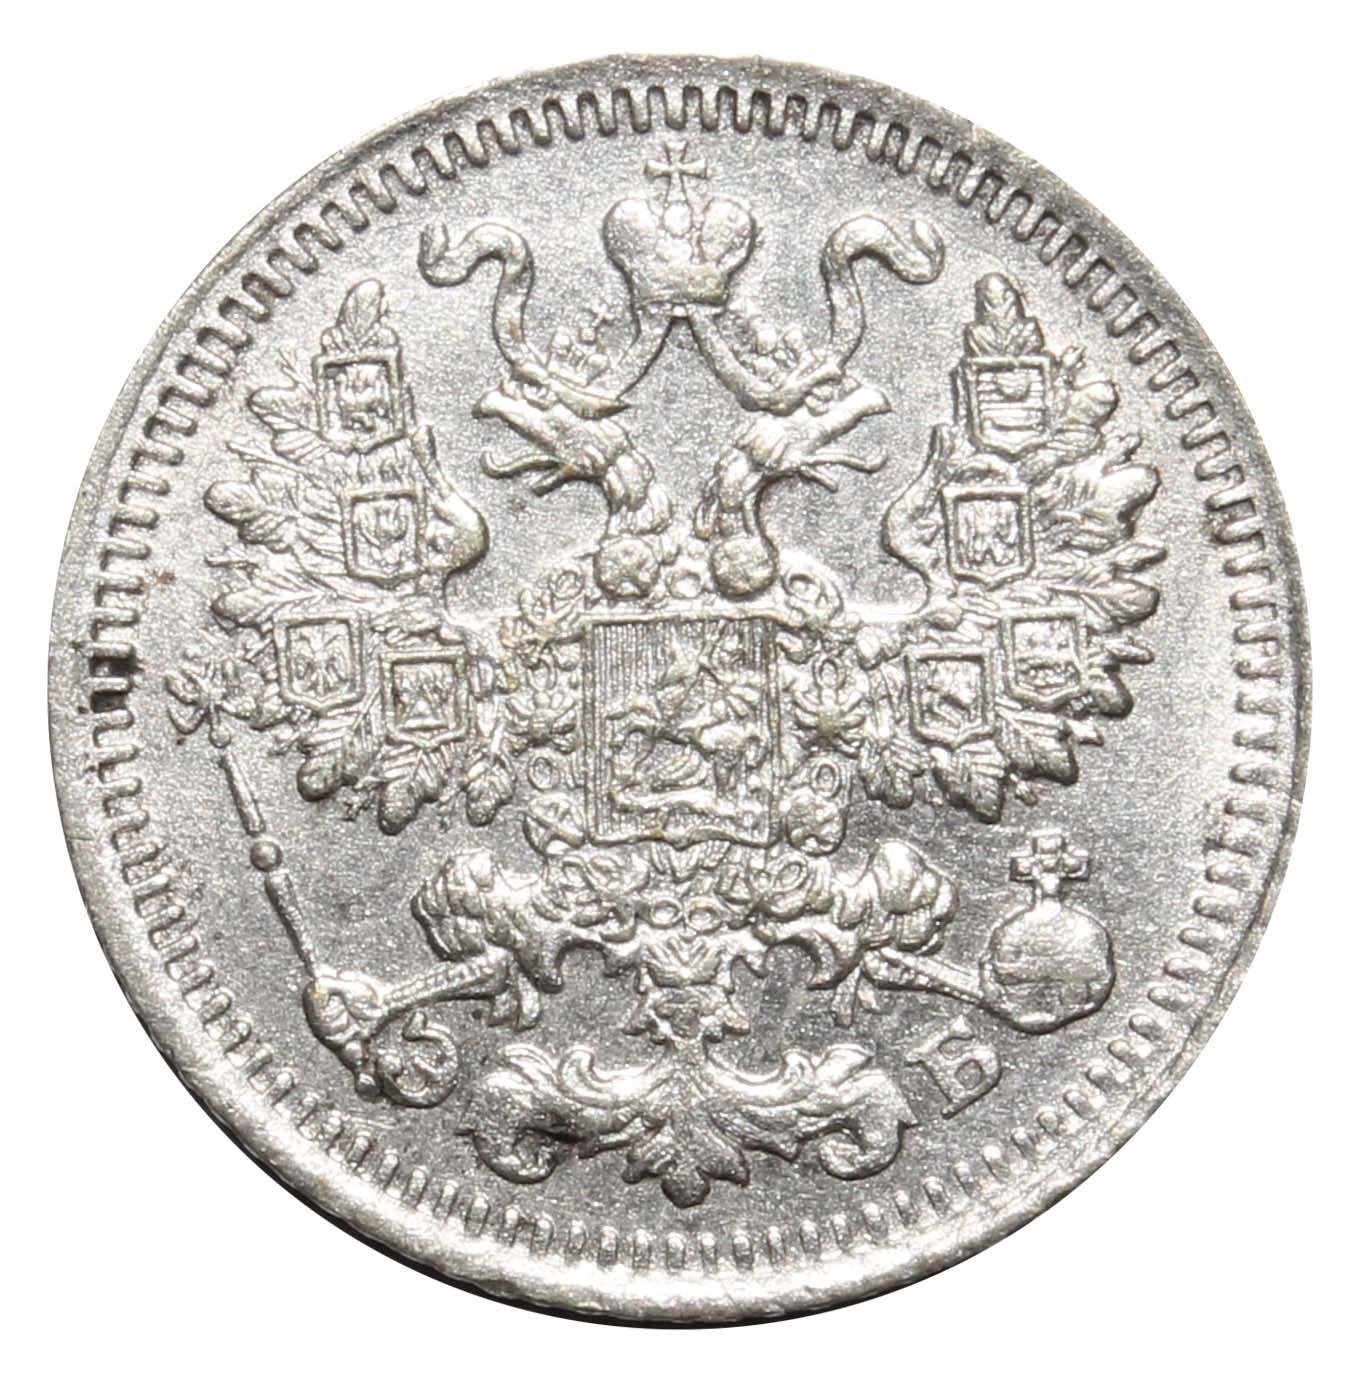 5 копеек 1912 год. СПБ ЭБ. Николай II. XF-